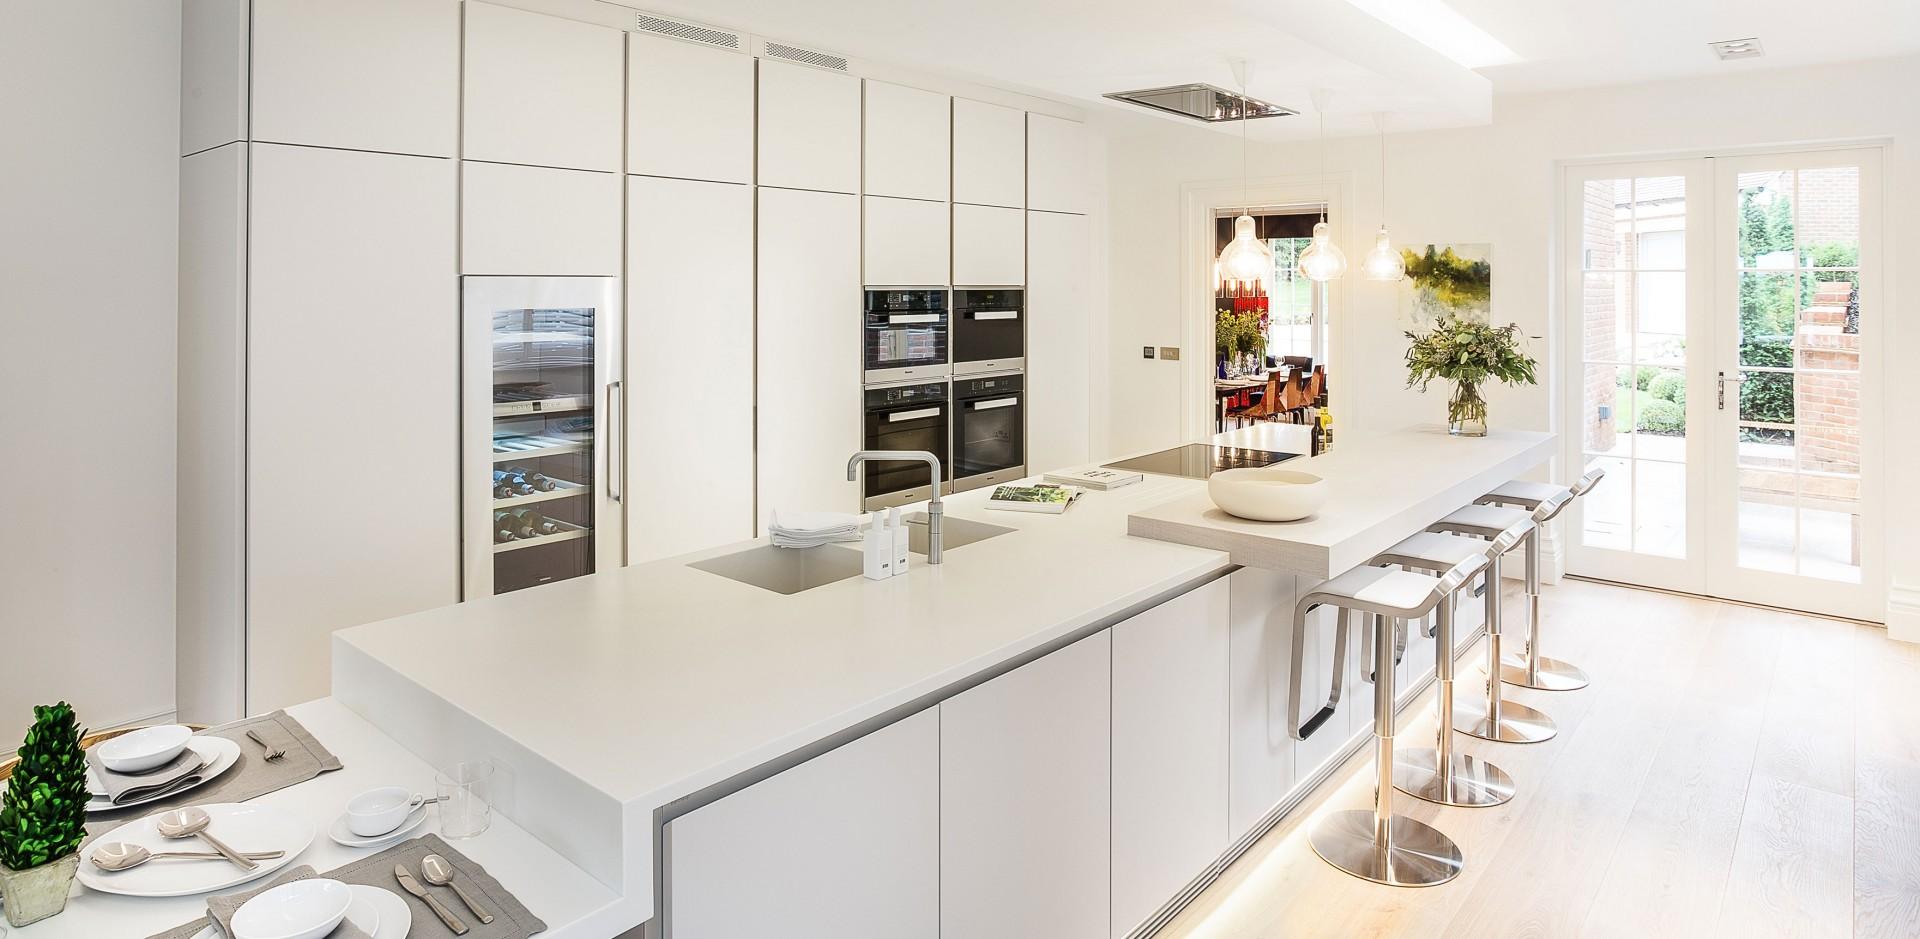 Corian Kitchens